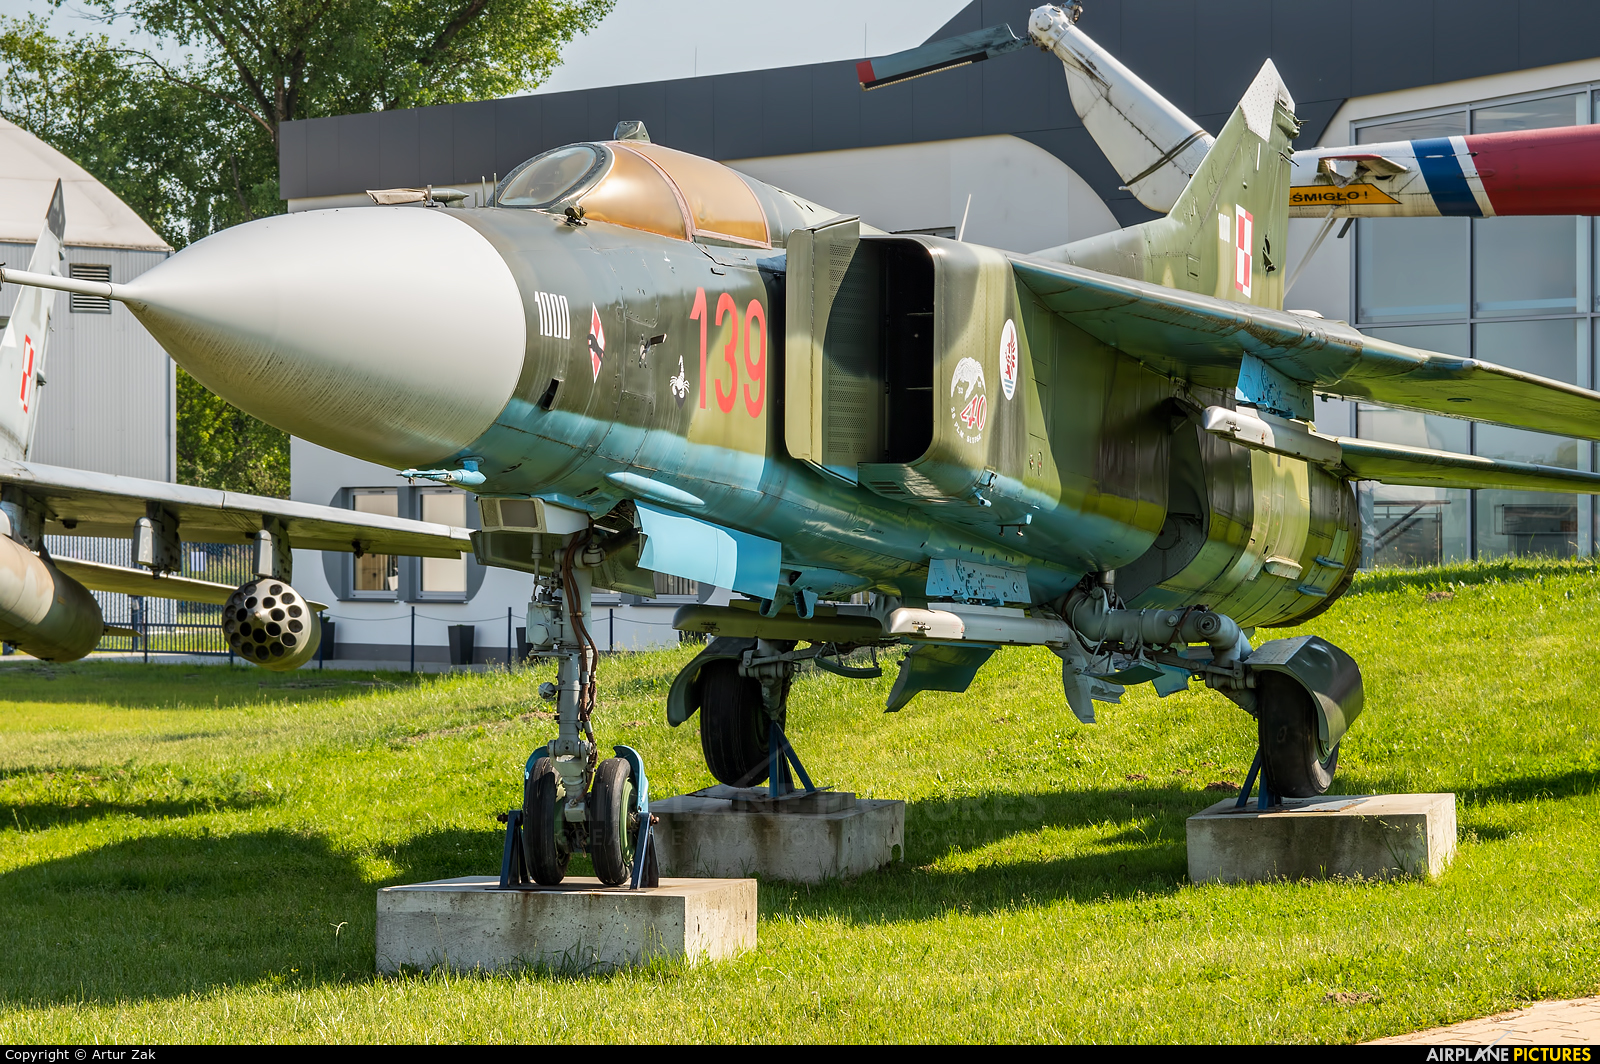 Poland - Air Force 139 aircraft at Dęblin - Museum of Polish Air Force